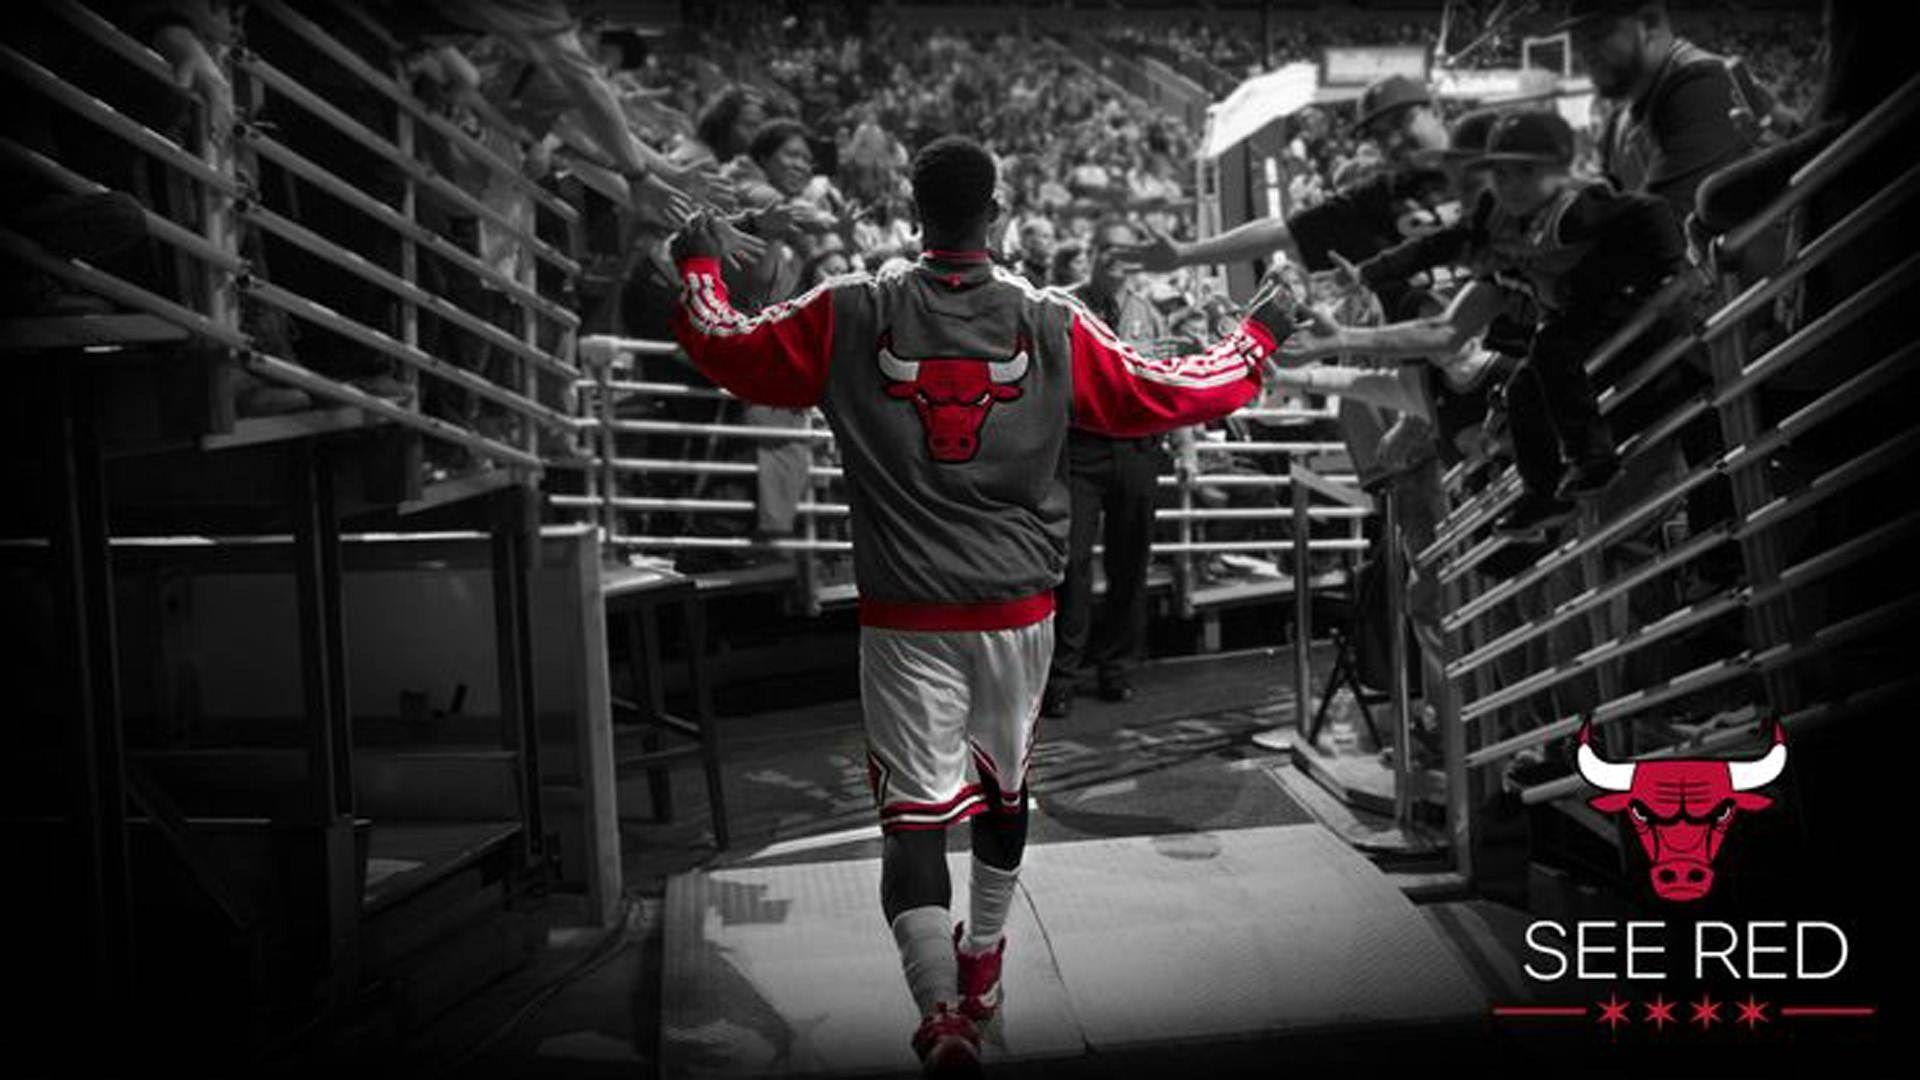 Hd Jimmy Butler Wallpapers Chicago Bulls Wallpaper Bulls Wallpaper Chicago Sports Teams